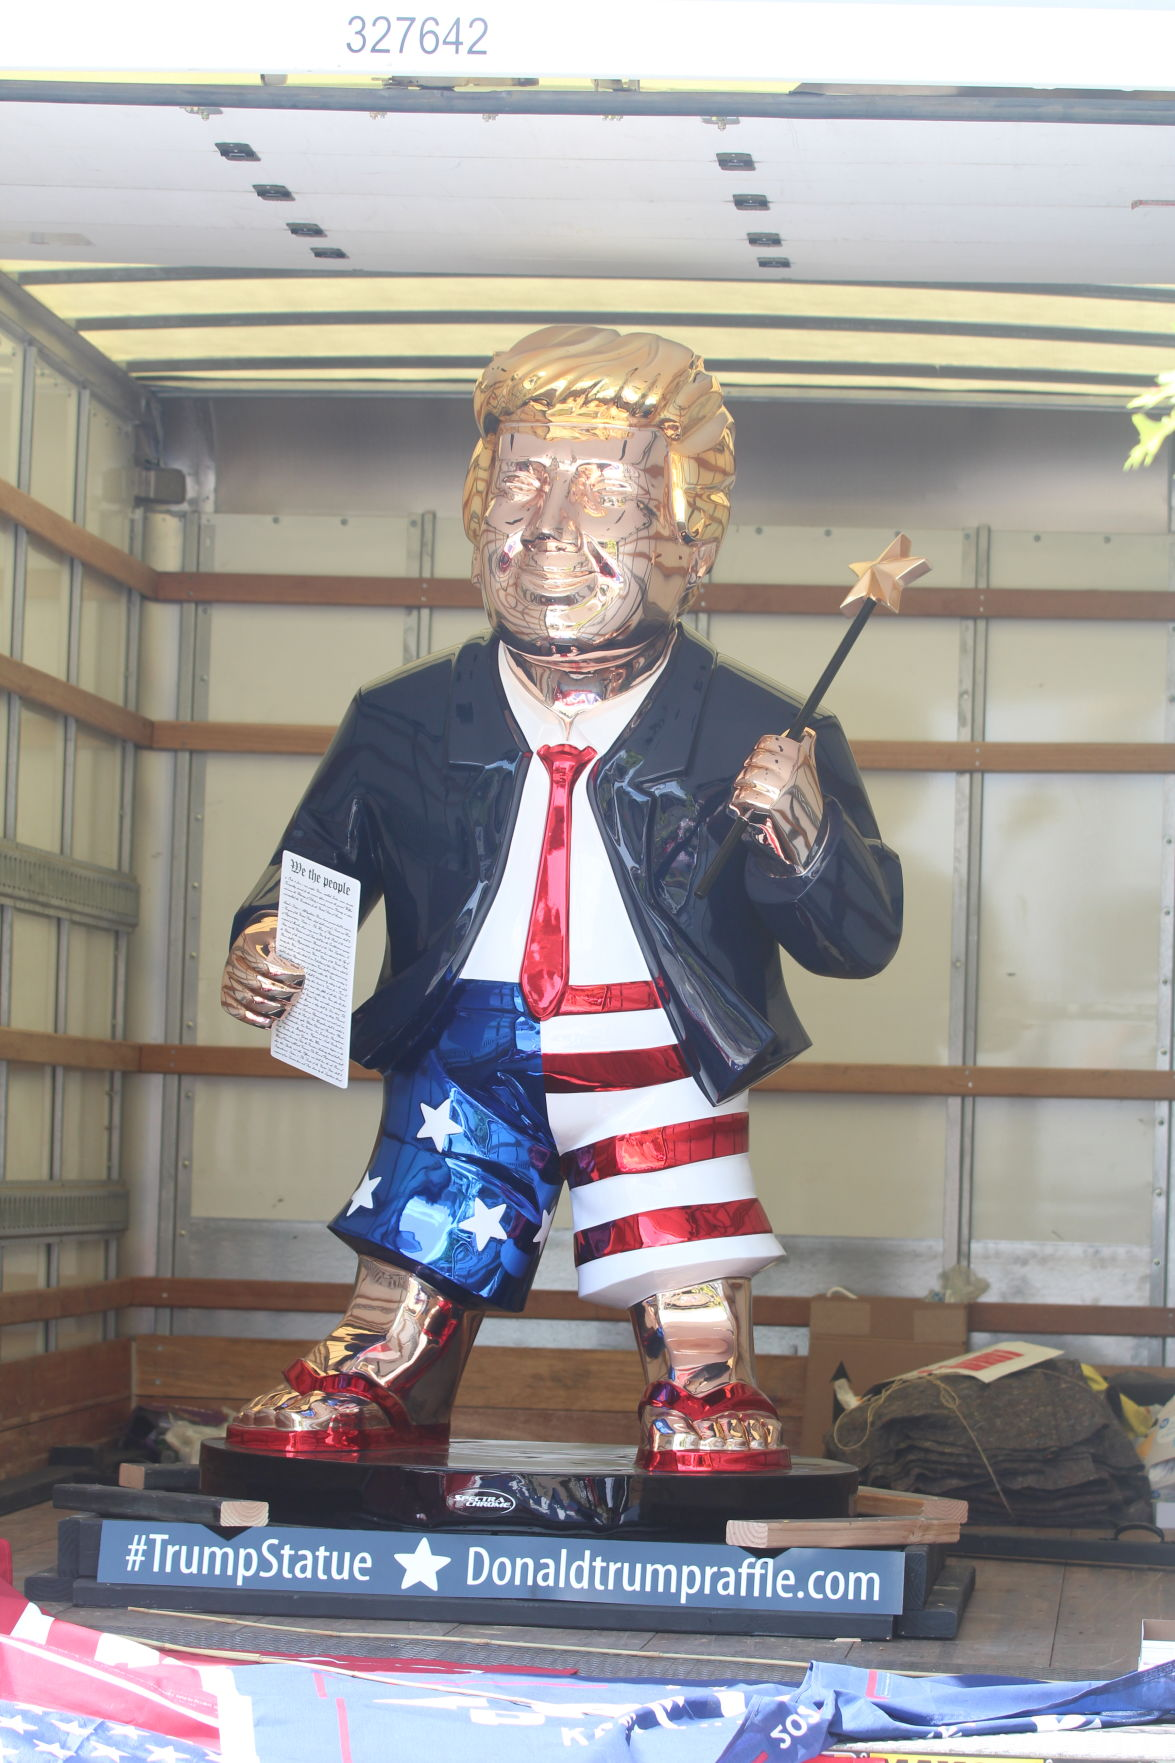 Trump Rally Statue.JPG